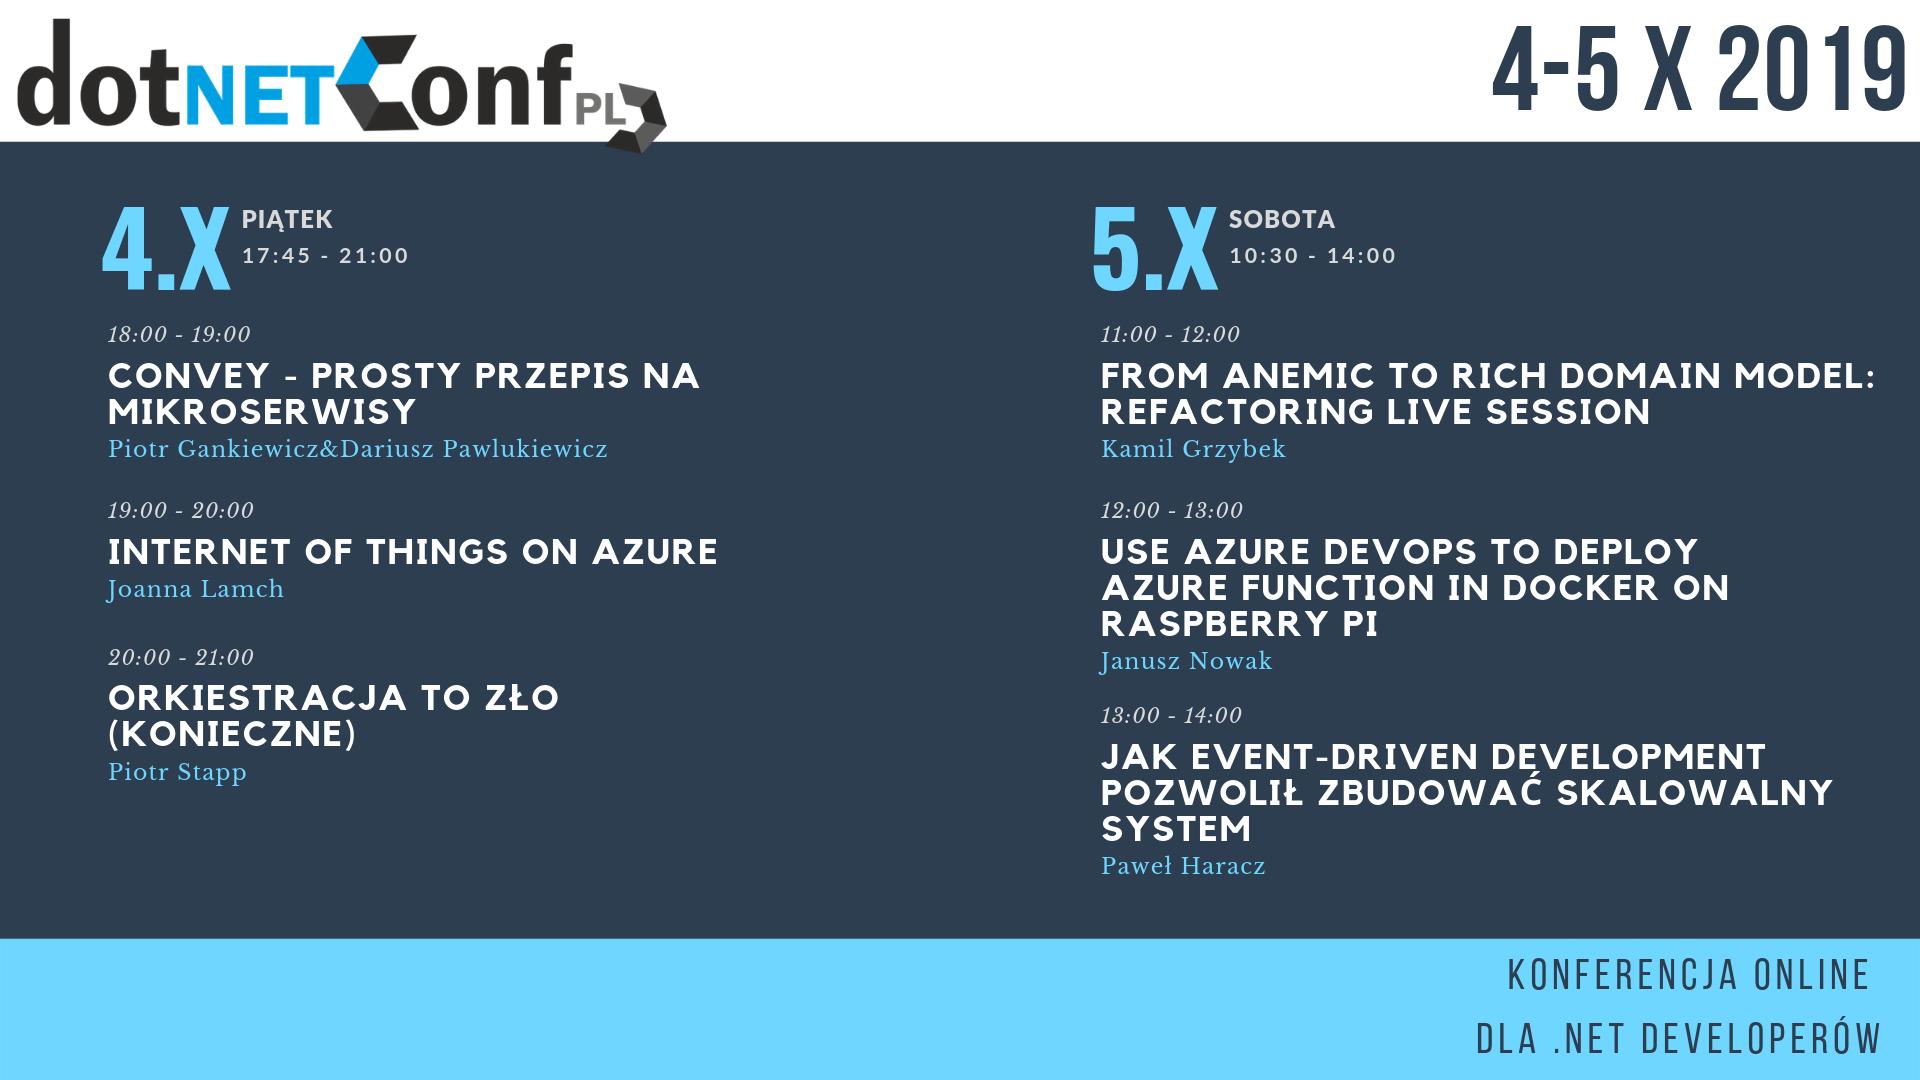 7 edycja dotnetconf_Agenda.png